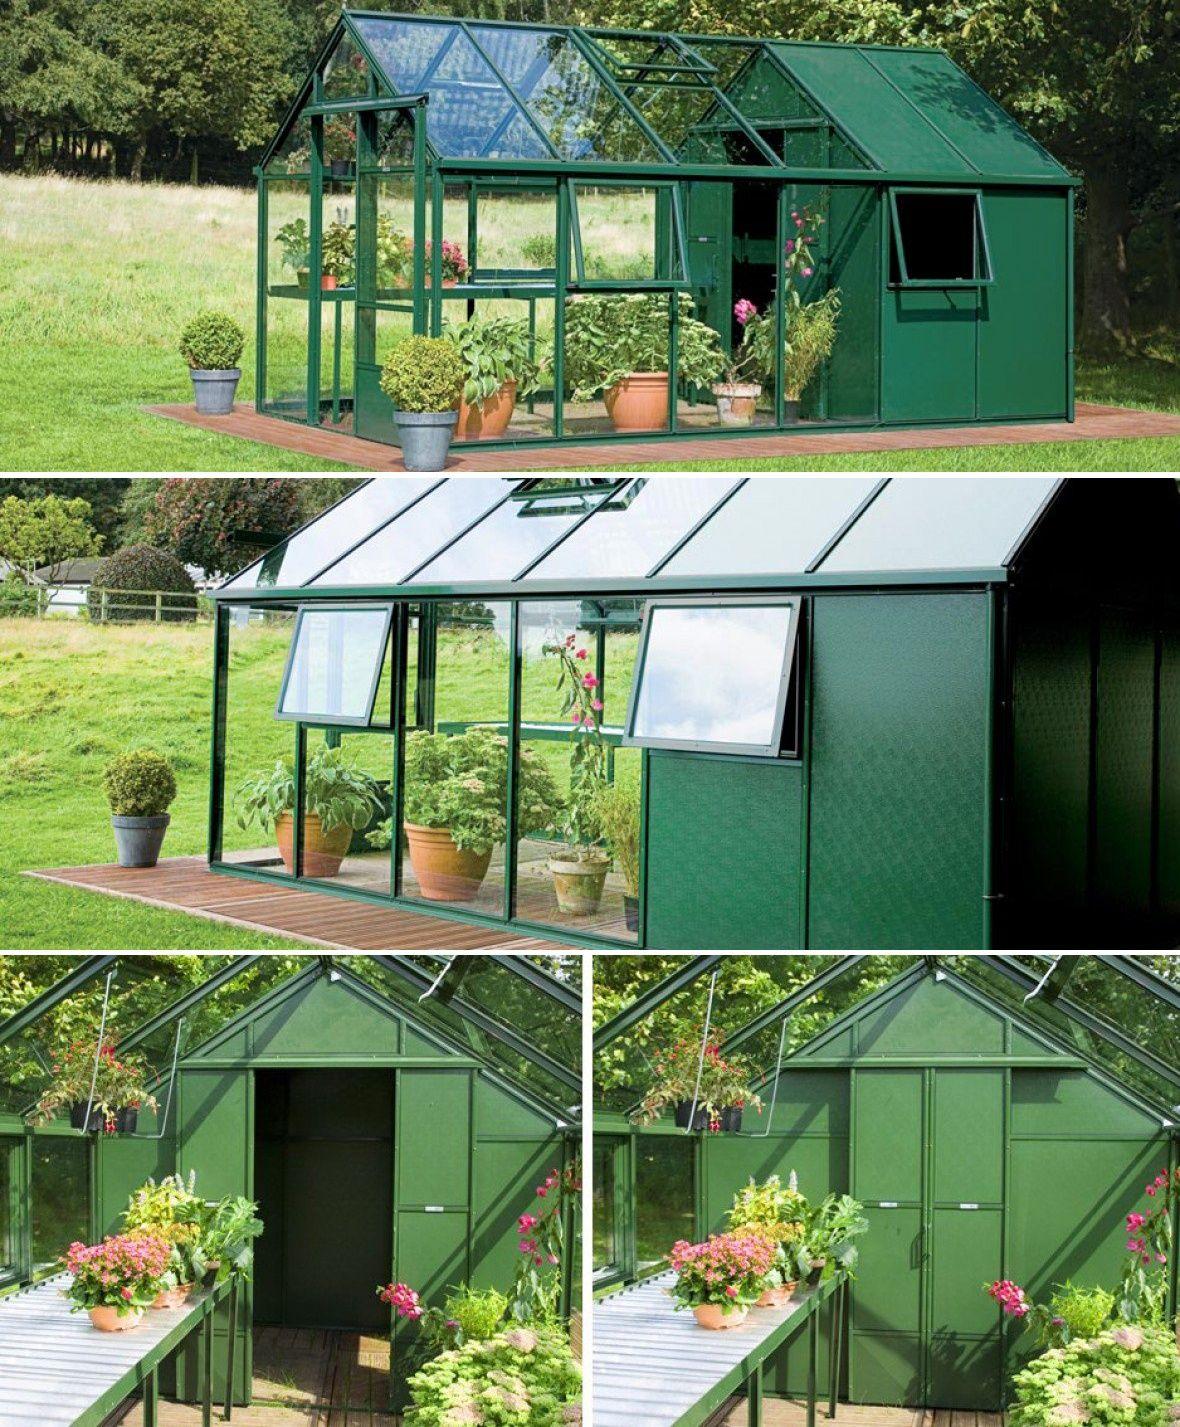 Greenhouse She Shed 22 Awesome Diy Kit Ideas Greenhouse Greenhouse Shed Diy Greenhouse